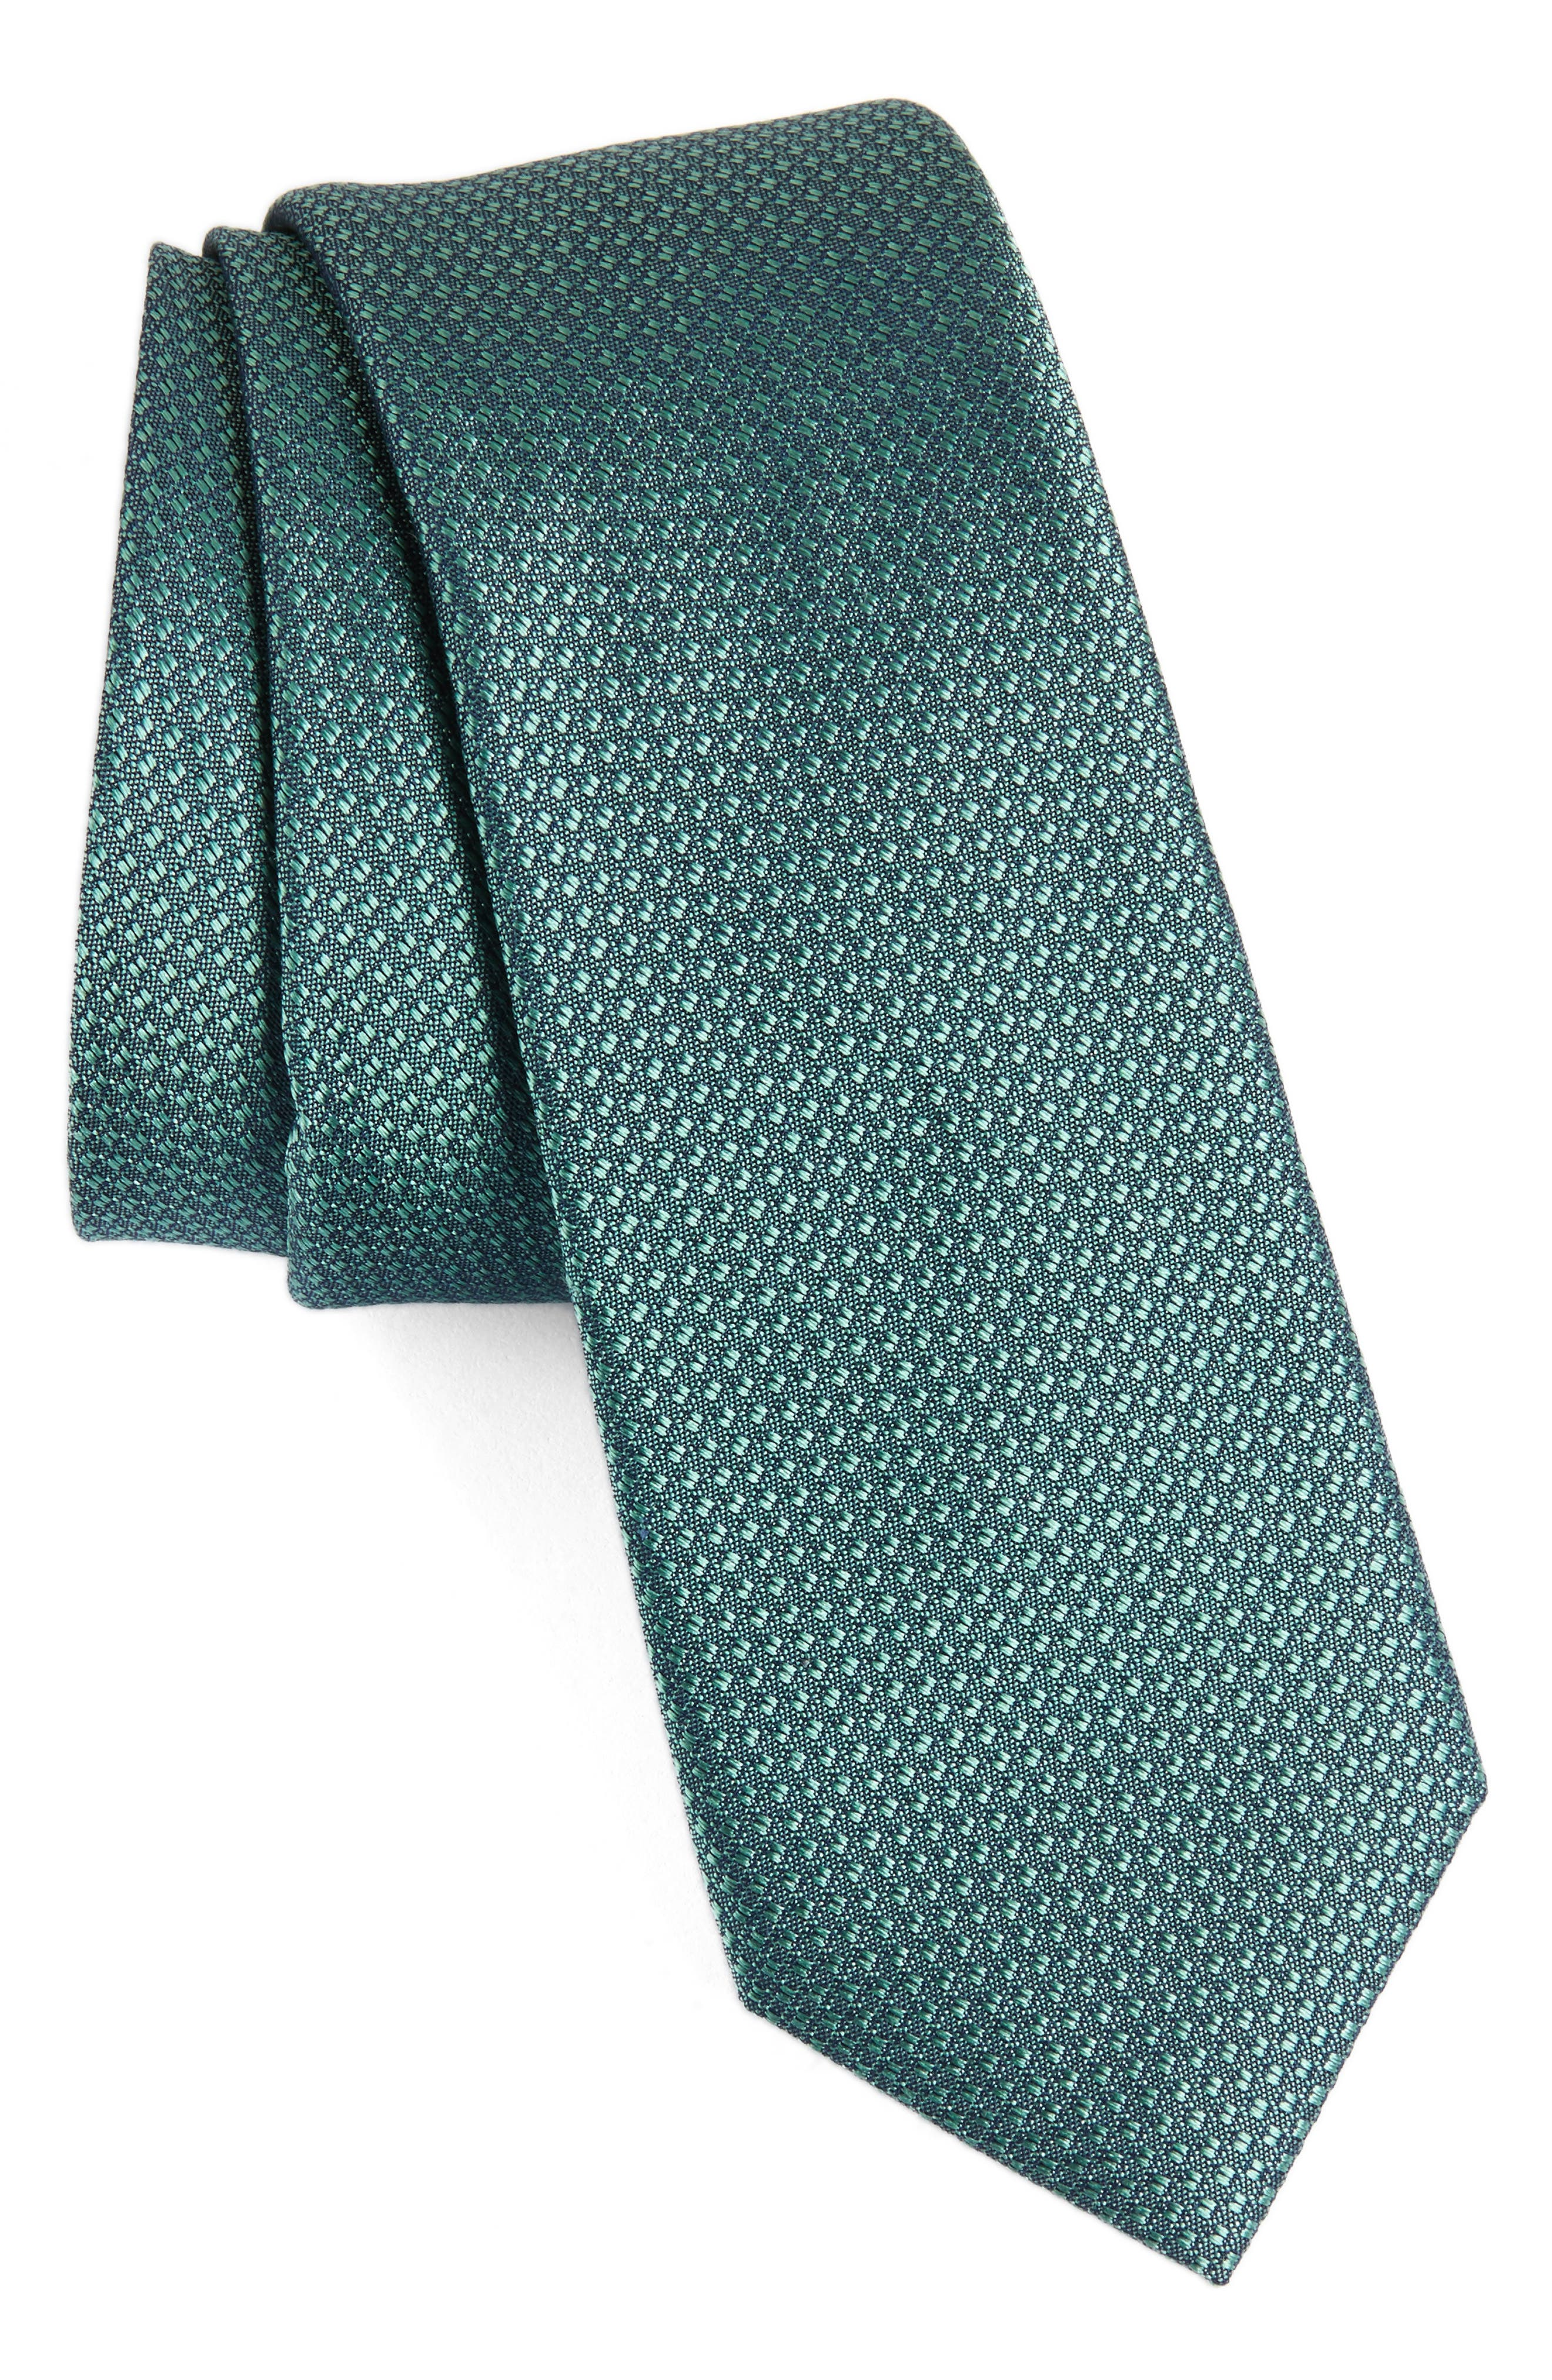 Seattle Textured Silk Tie,                             Main thumbnail 29, color,